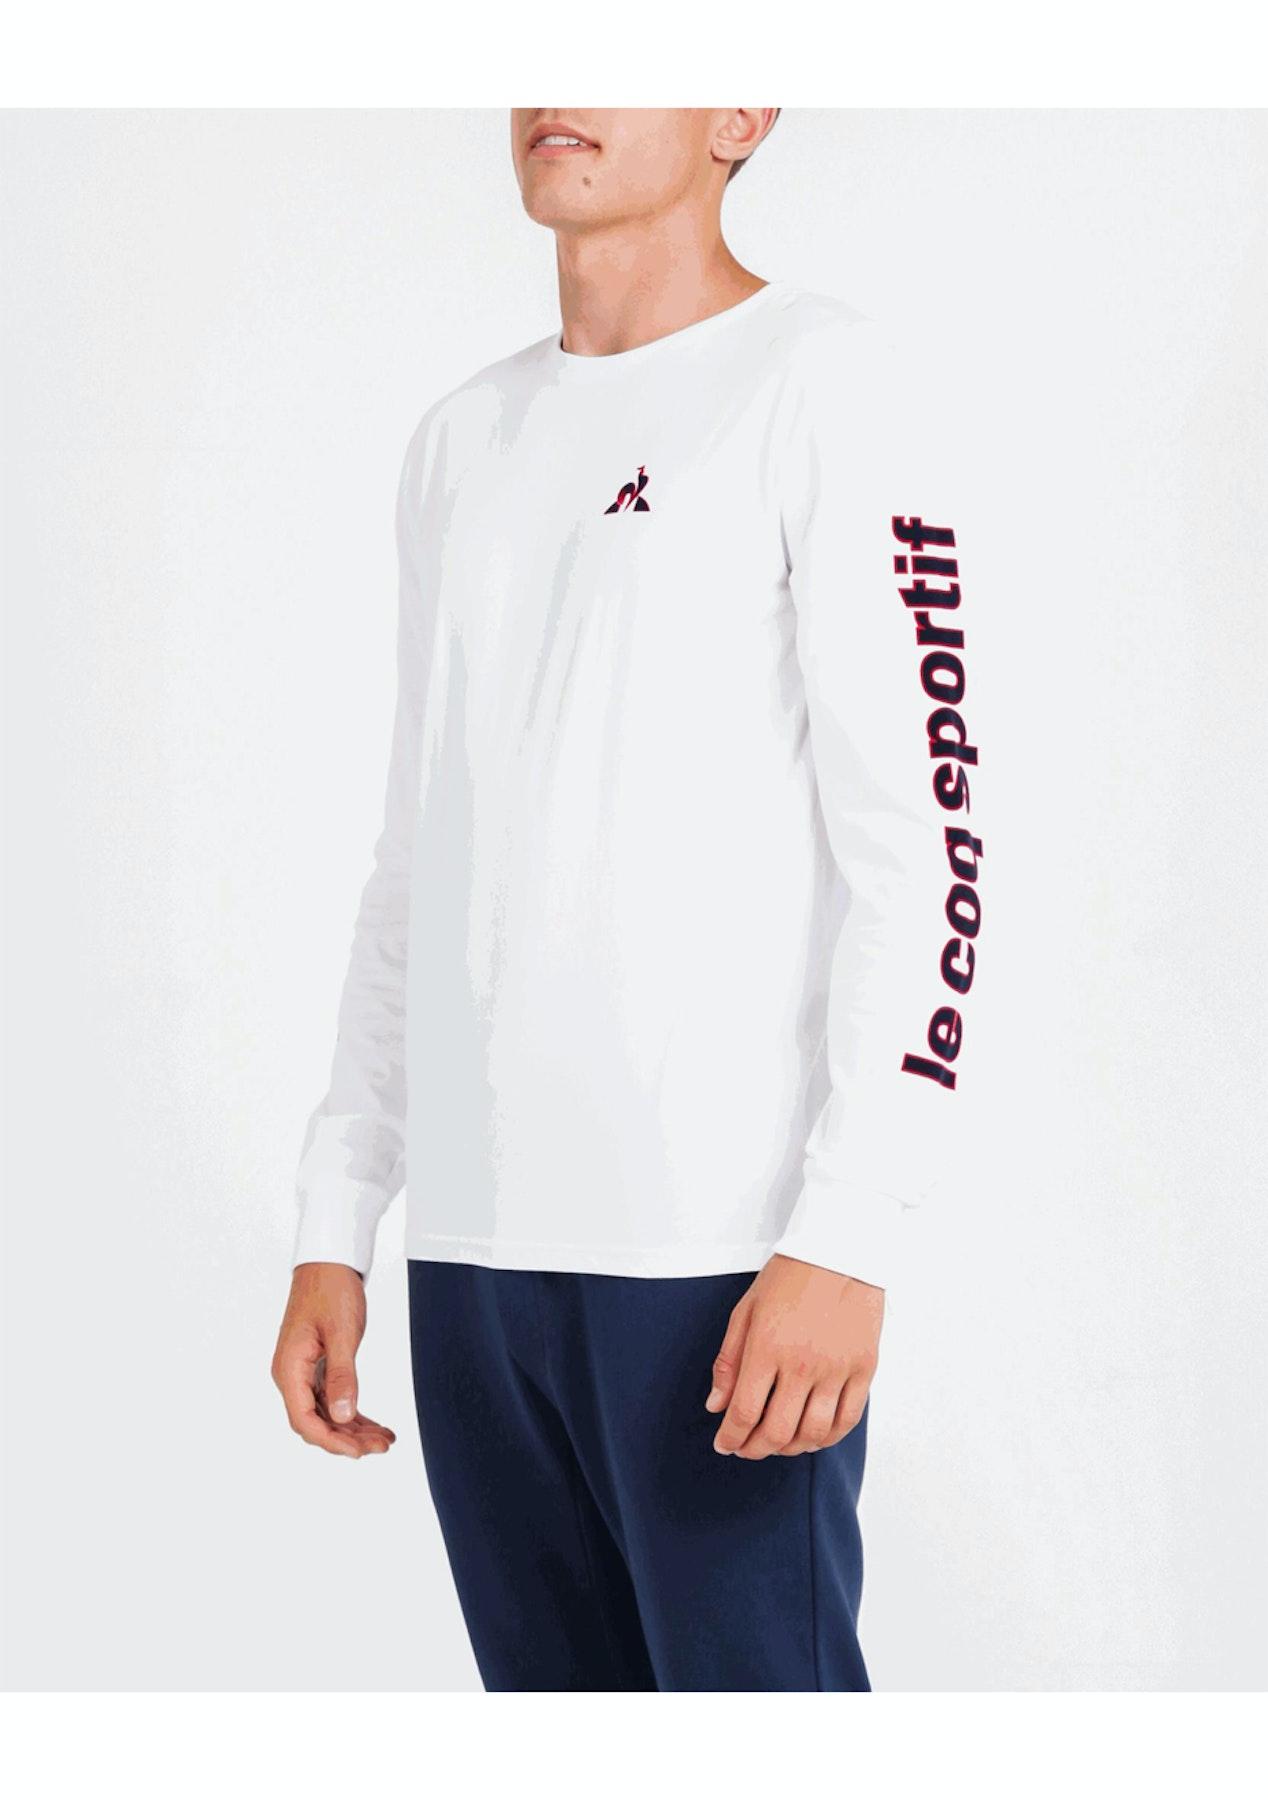 4de630d19bf6 Le Coq Sportif - Mens Jenner Long Sleeve Tee - White - Big Brand Mens  Outlet - Onceit